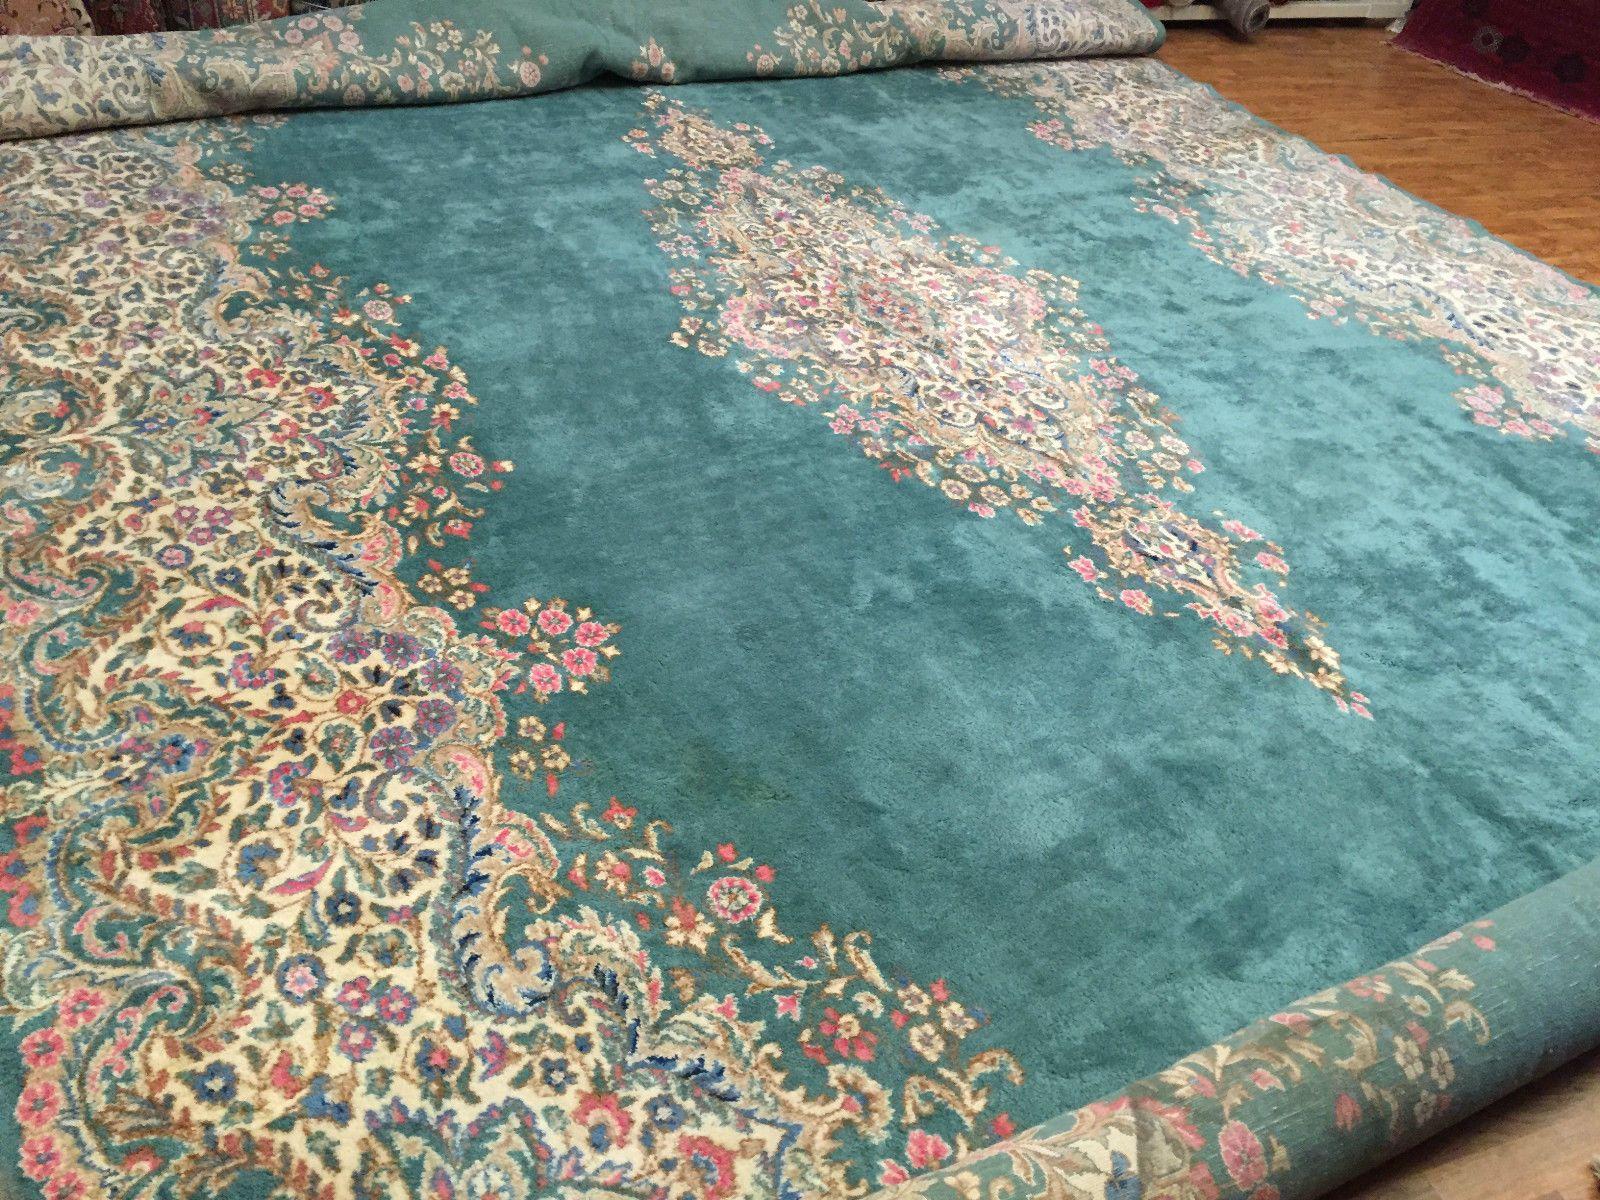 Handmade Persian Kerman Rug Turquoise Blue Size 12 Ft X 21 Beautiful